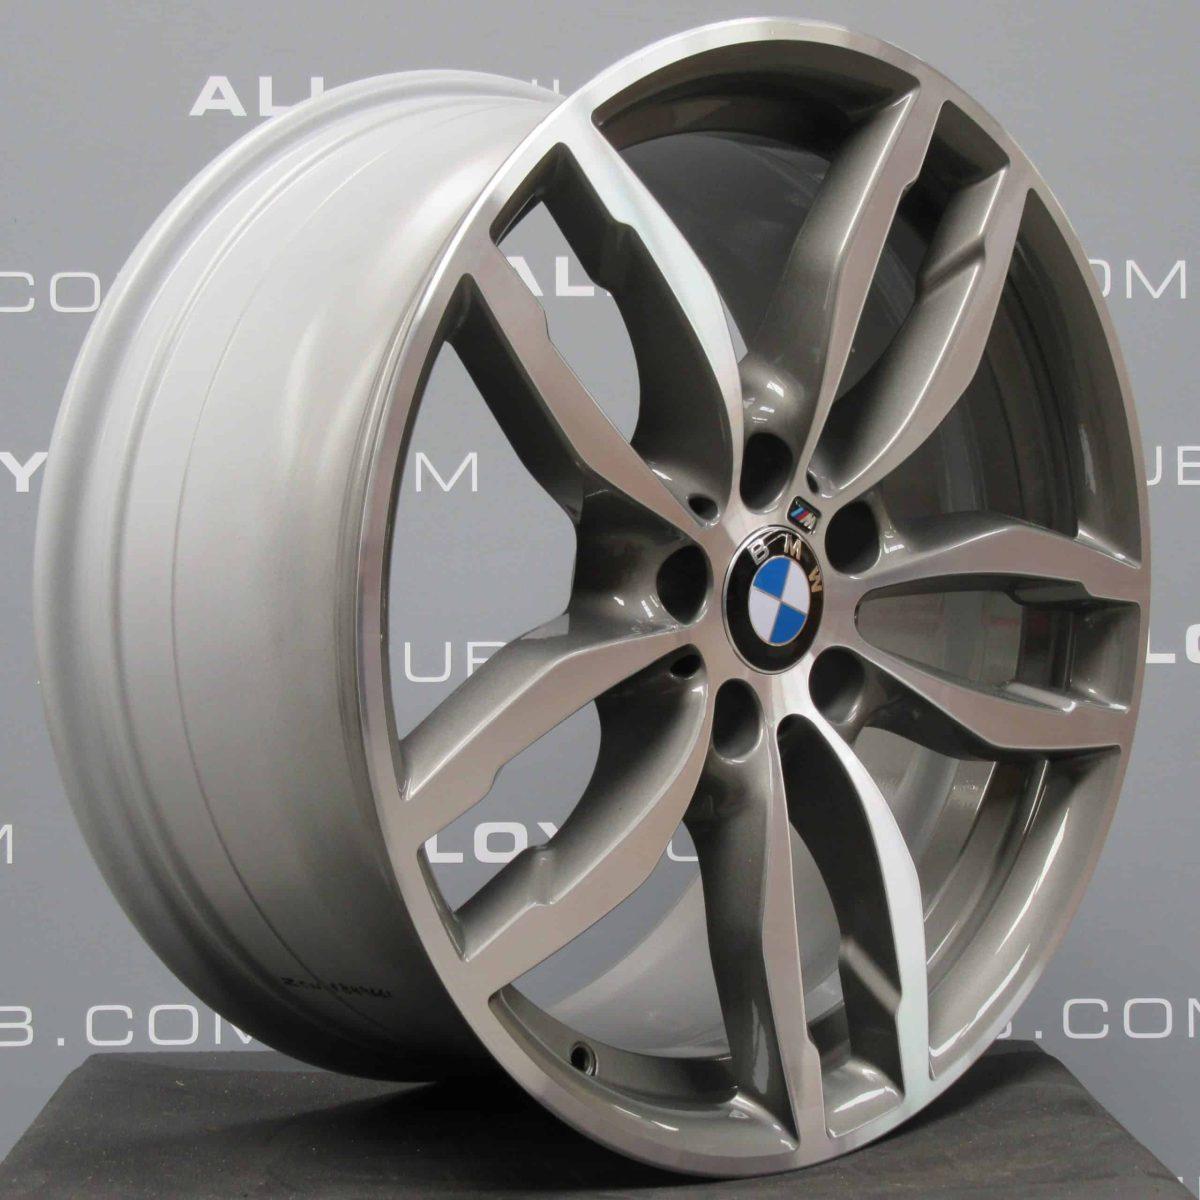 BMW X3/X4 F25/F26 Style 622M Grey/Polished 19″ 5 Twin Spoke Alloy Wheel